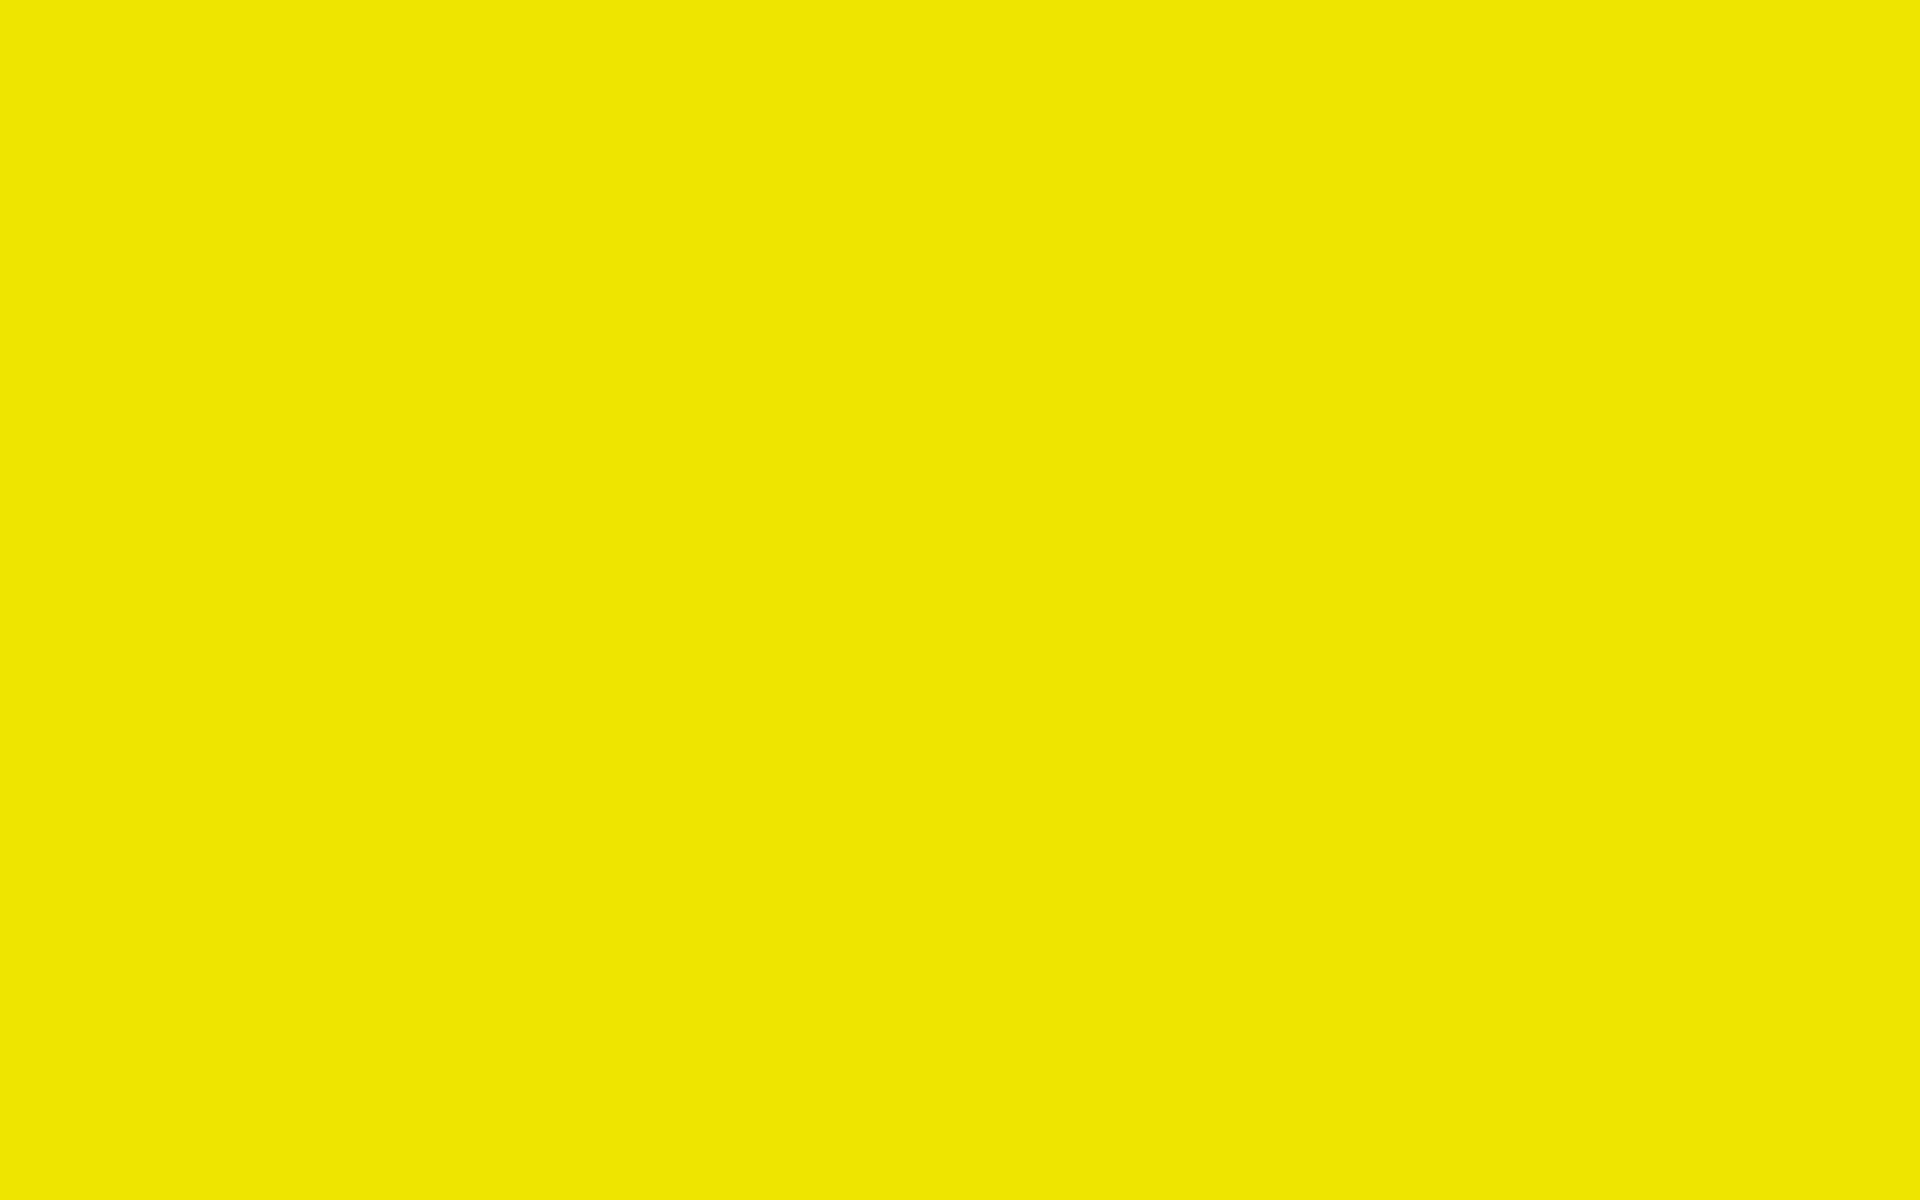 1920x1200 Titanium Yellow Solid Color Background